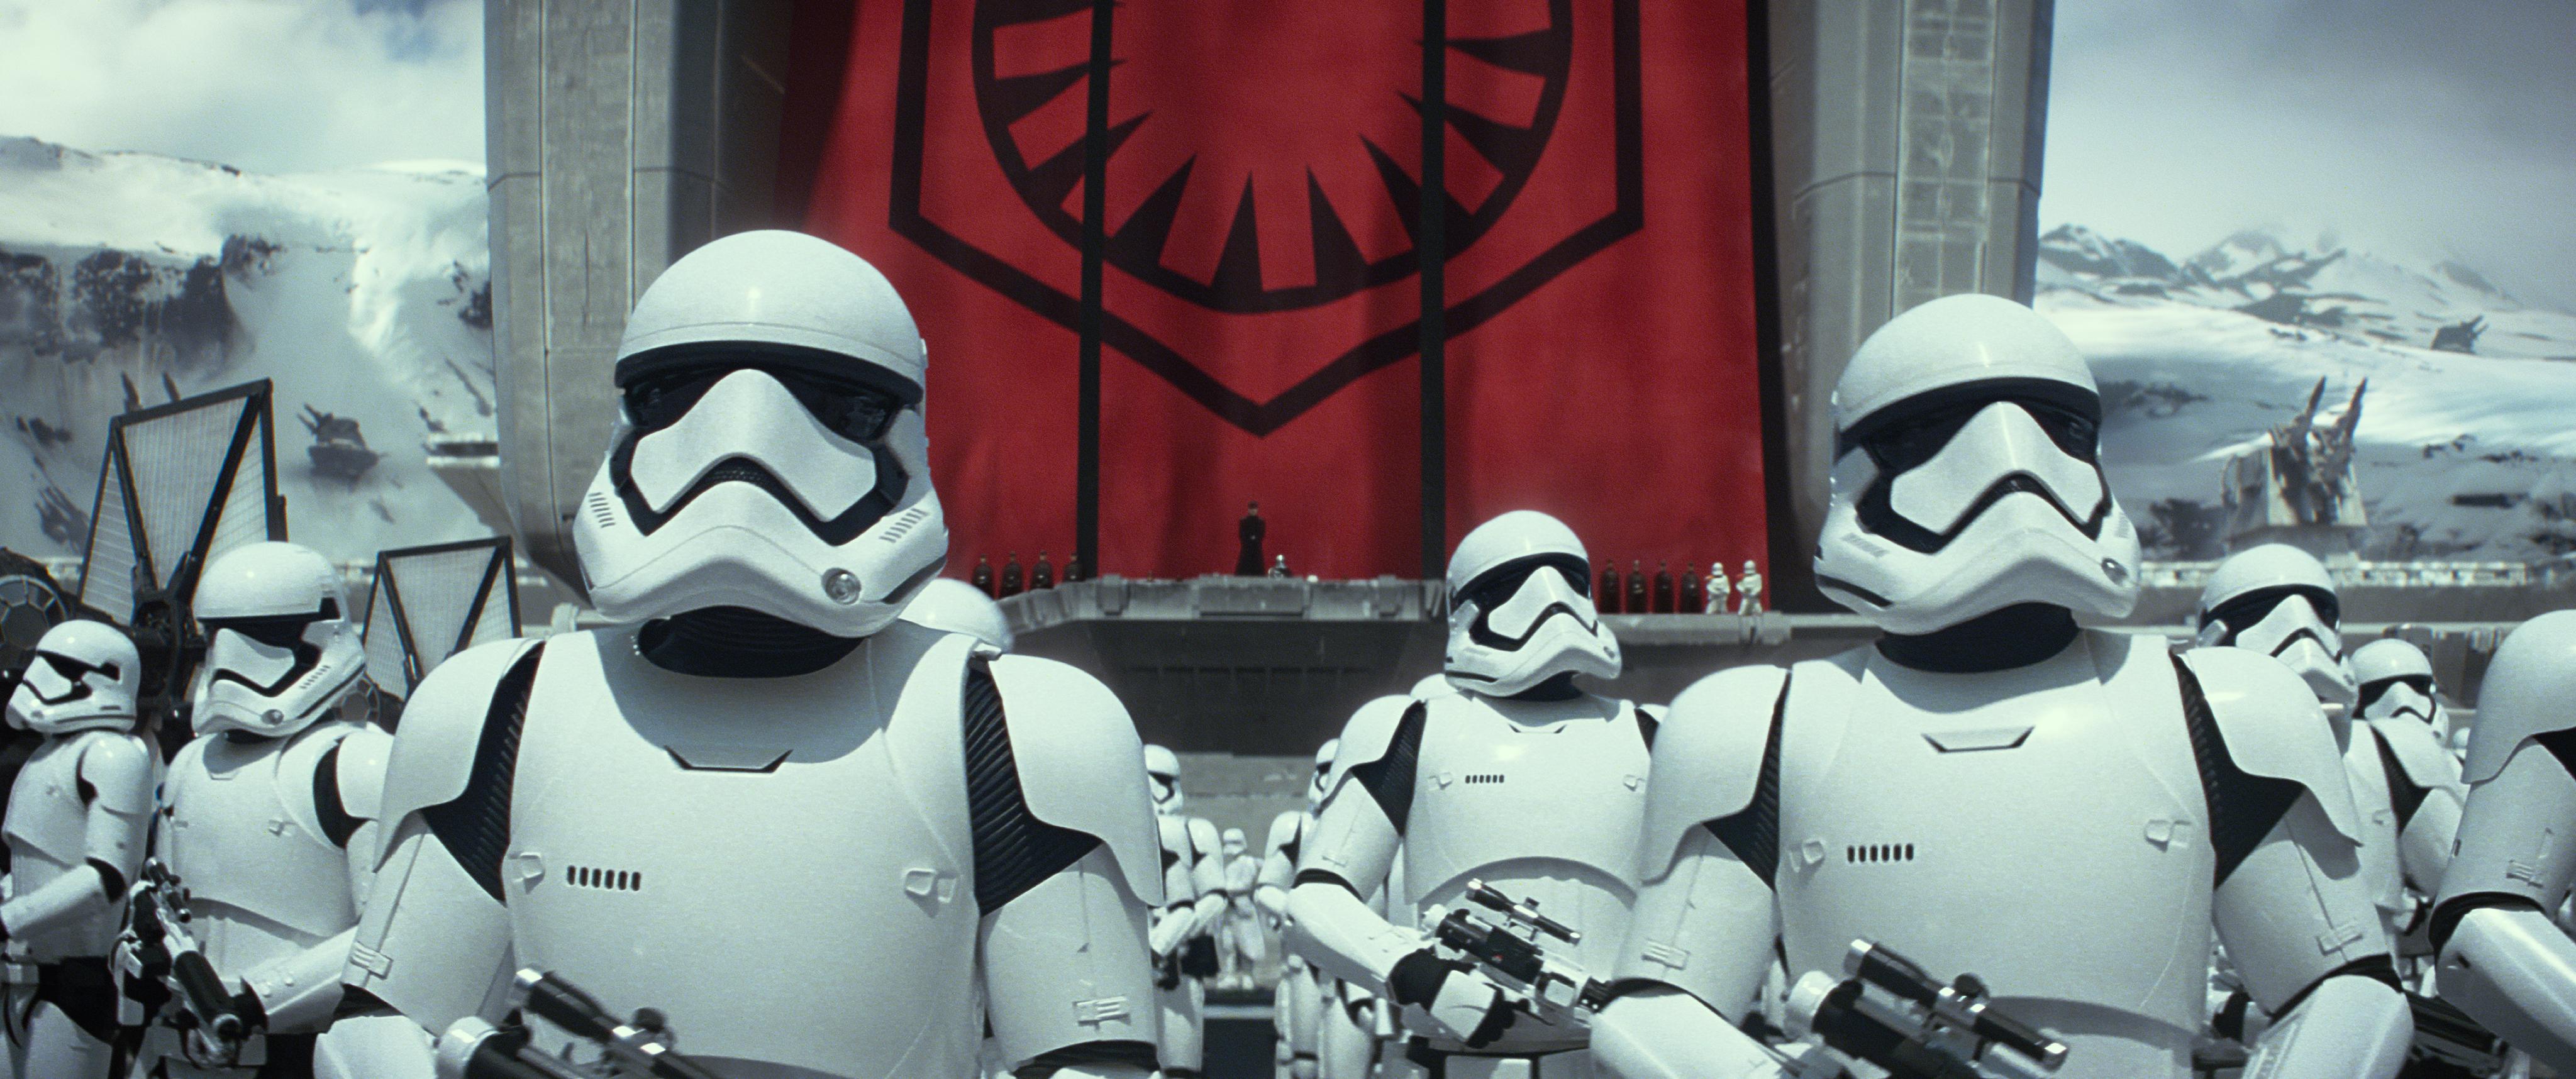 Star Wars The Force Awakens Wallpaper 7 Wallpapersbq